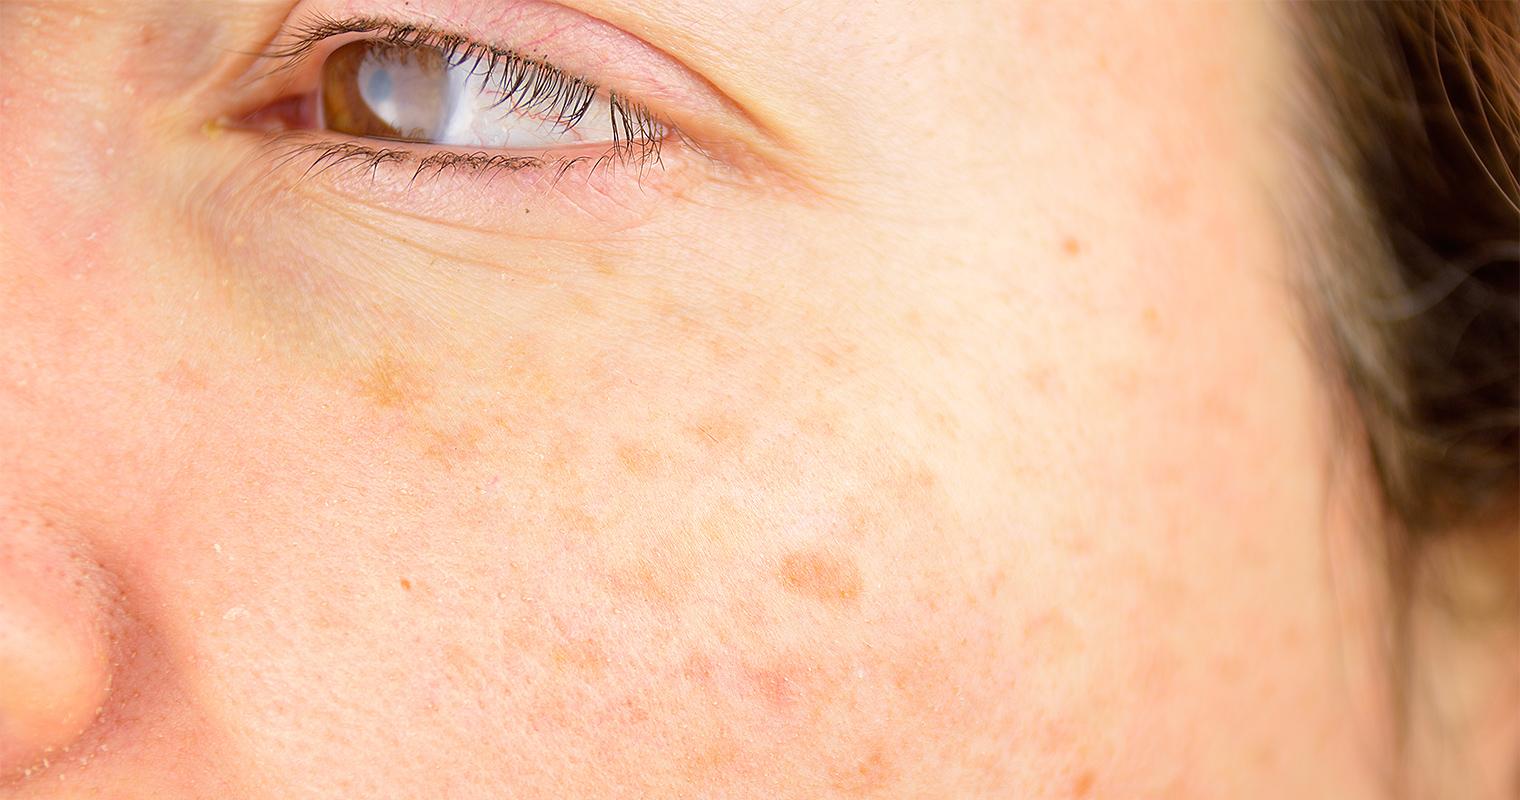 pigmentation on the cheek bone